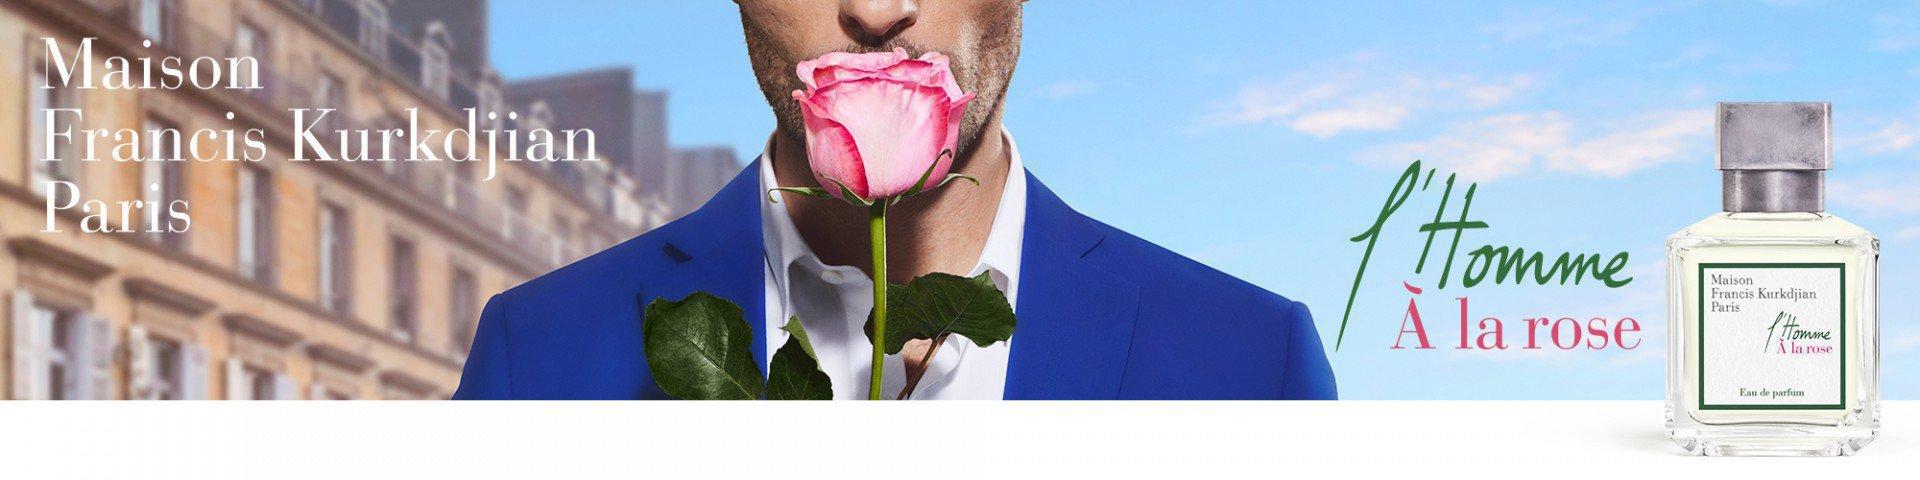 Maison Francis Kurkdjian L'Homme A la rose